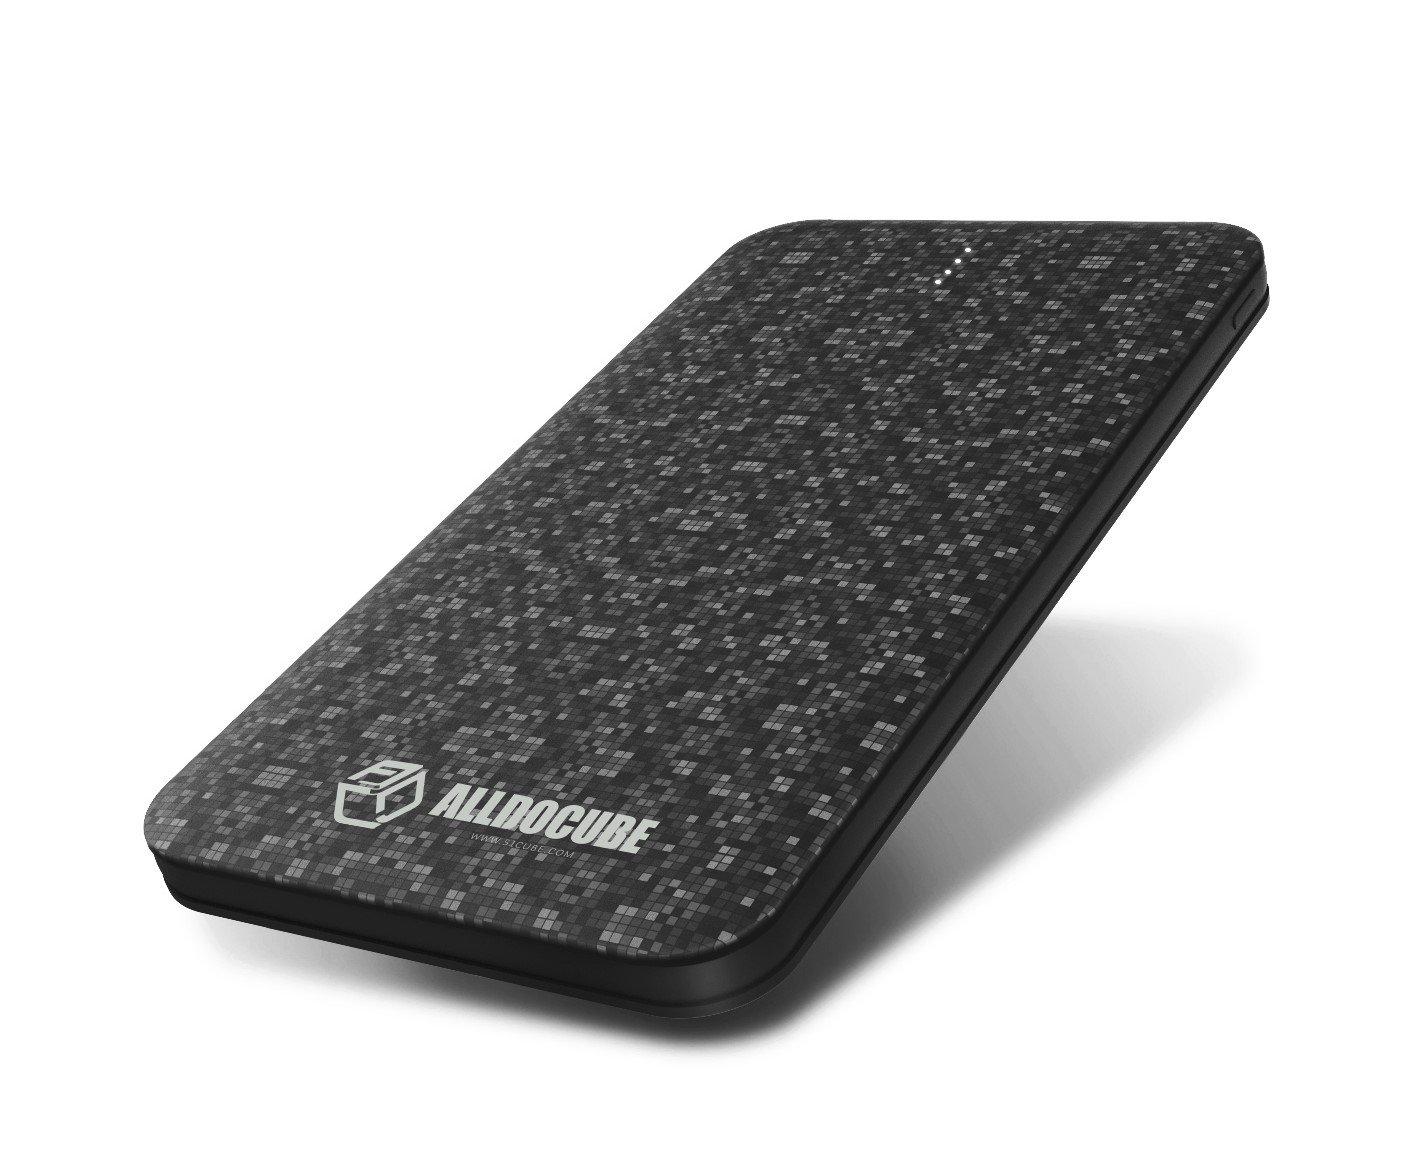 alldocube E52 5000 mAh Ultra Delgado, ligero portátil de Batería Power Bank con Dual USB Puertos de salida para iPhone, iPad y Android dispositivos: ...